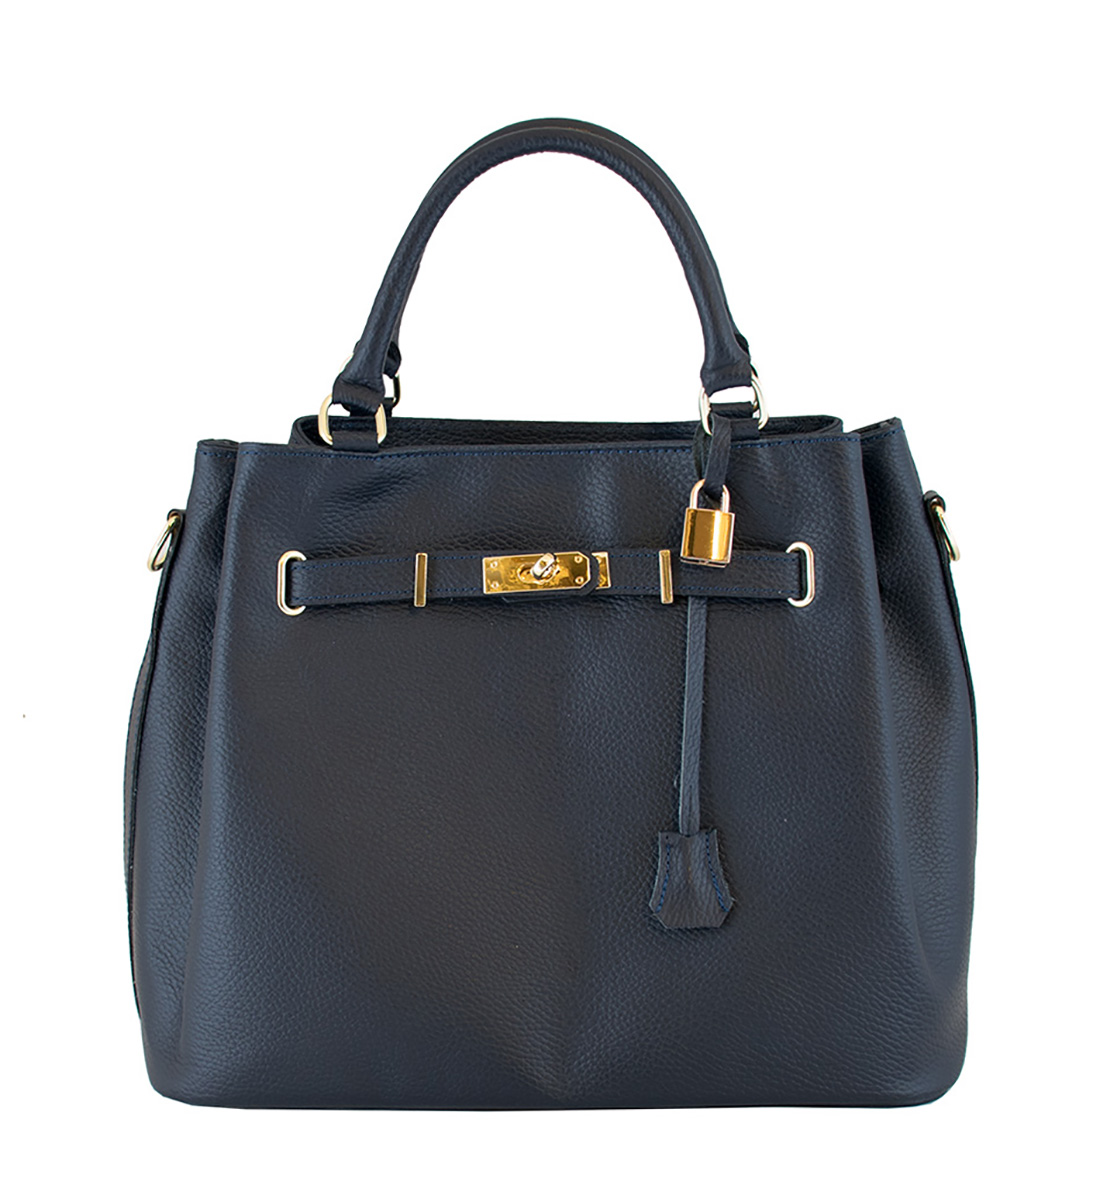 Bags and more Monalisa Kék Női Bőr Kézitáska